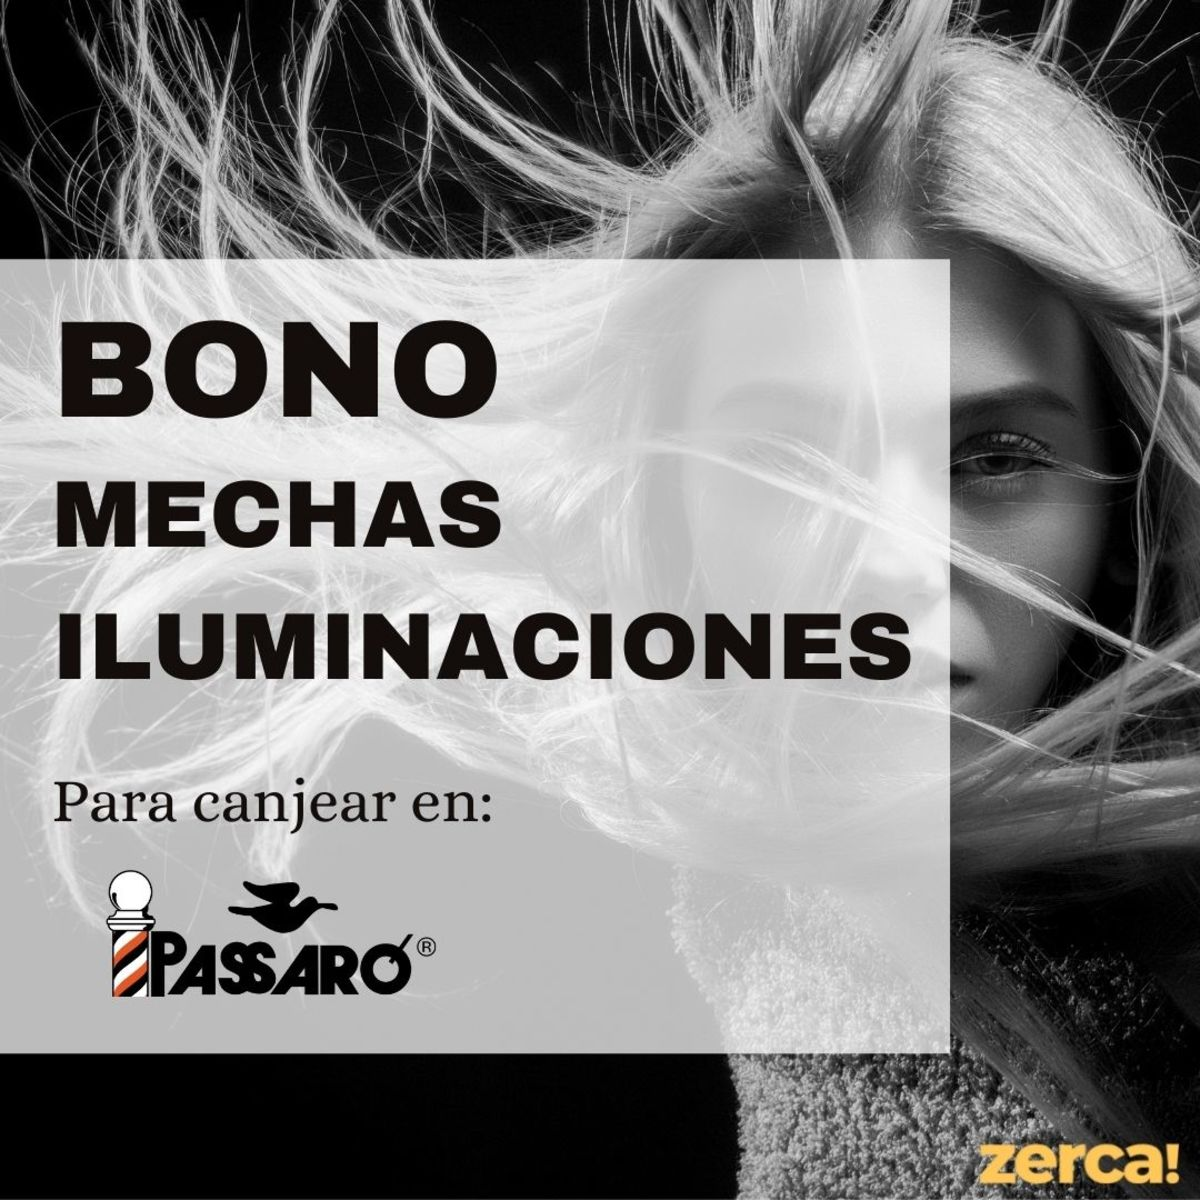 Bono mechas iluminaciones PARA CANJEAR EN PASSARÓ PLAZA SAN BRIZ